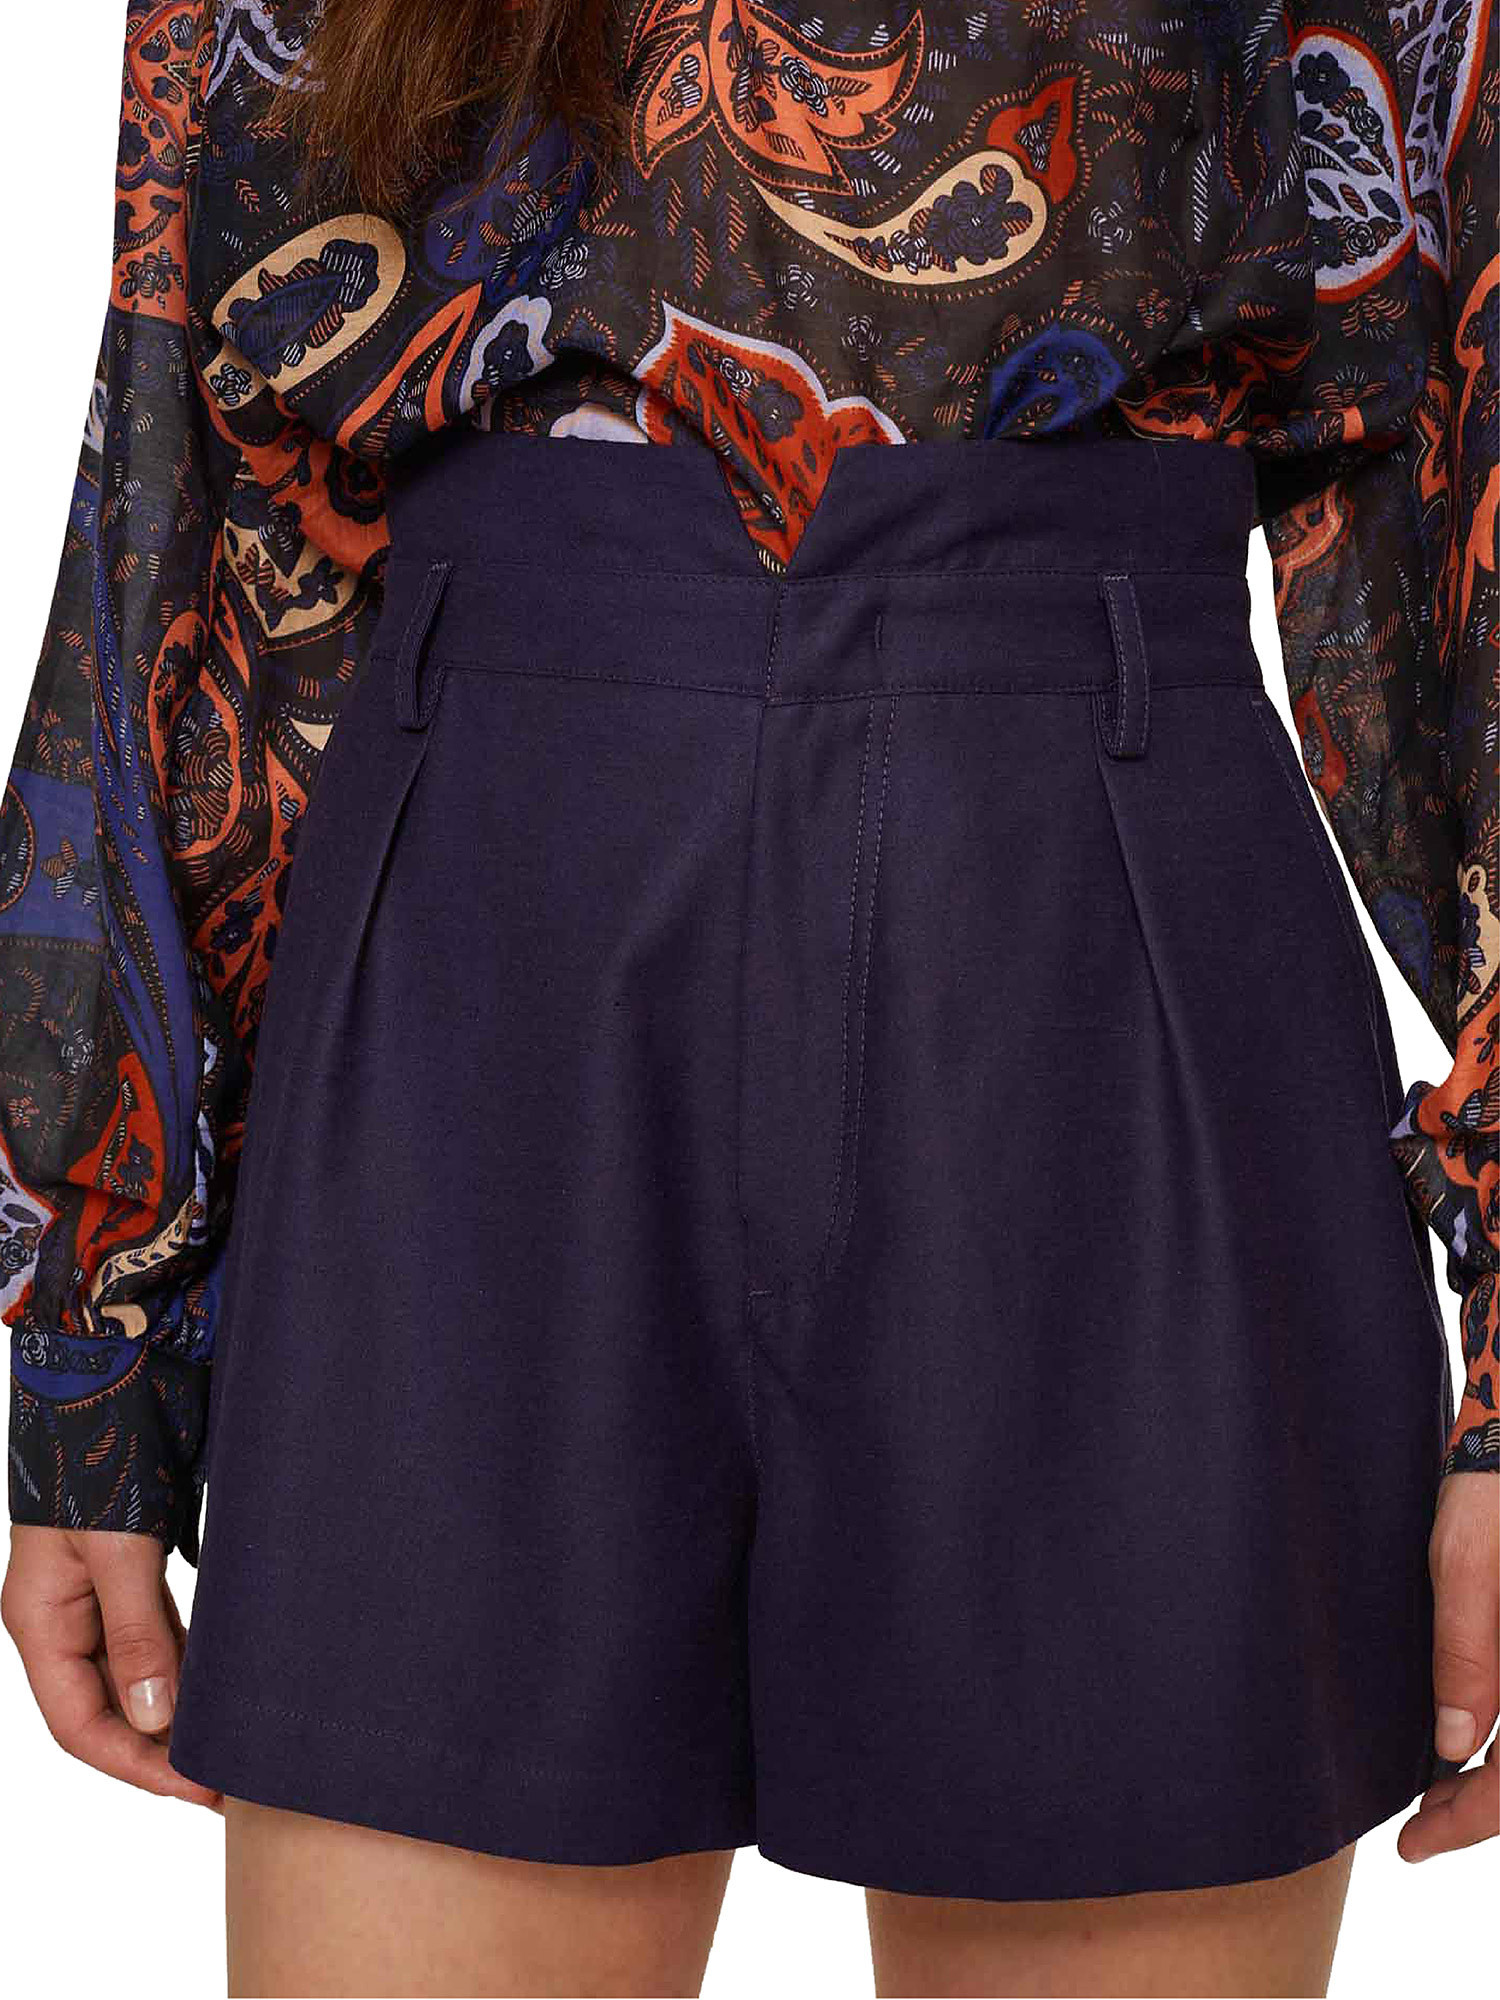 Shorts in shantung Ginger, Viola lilla, large image number 4